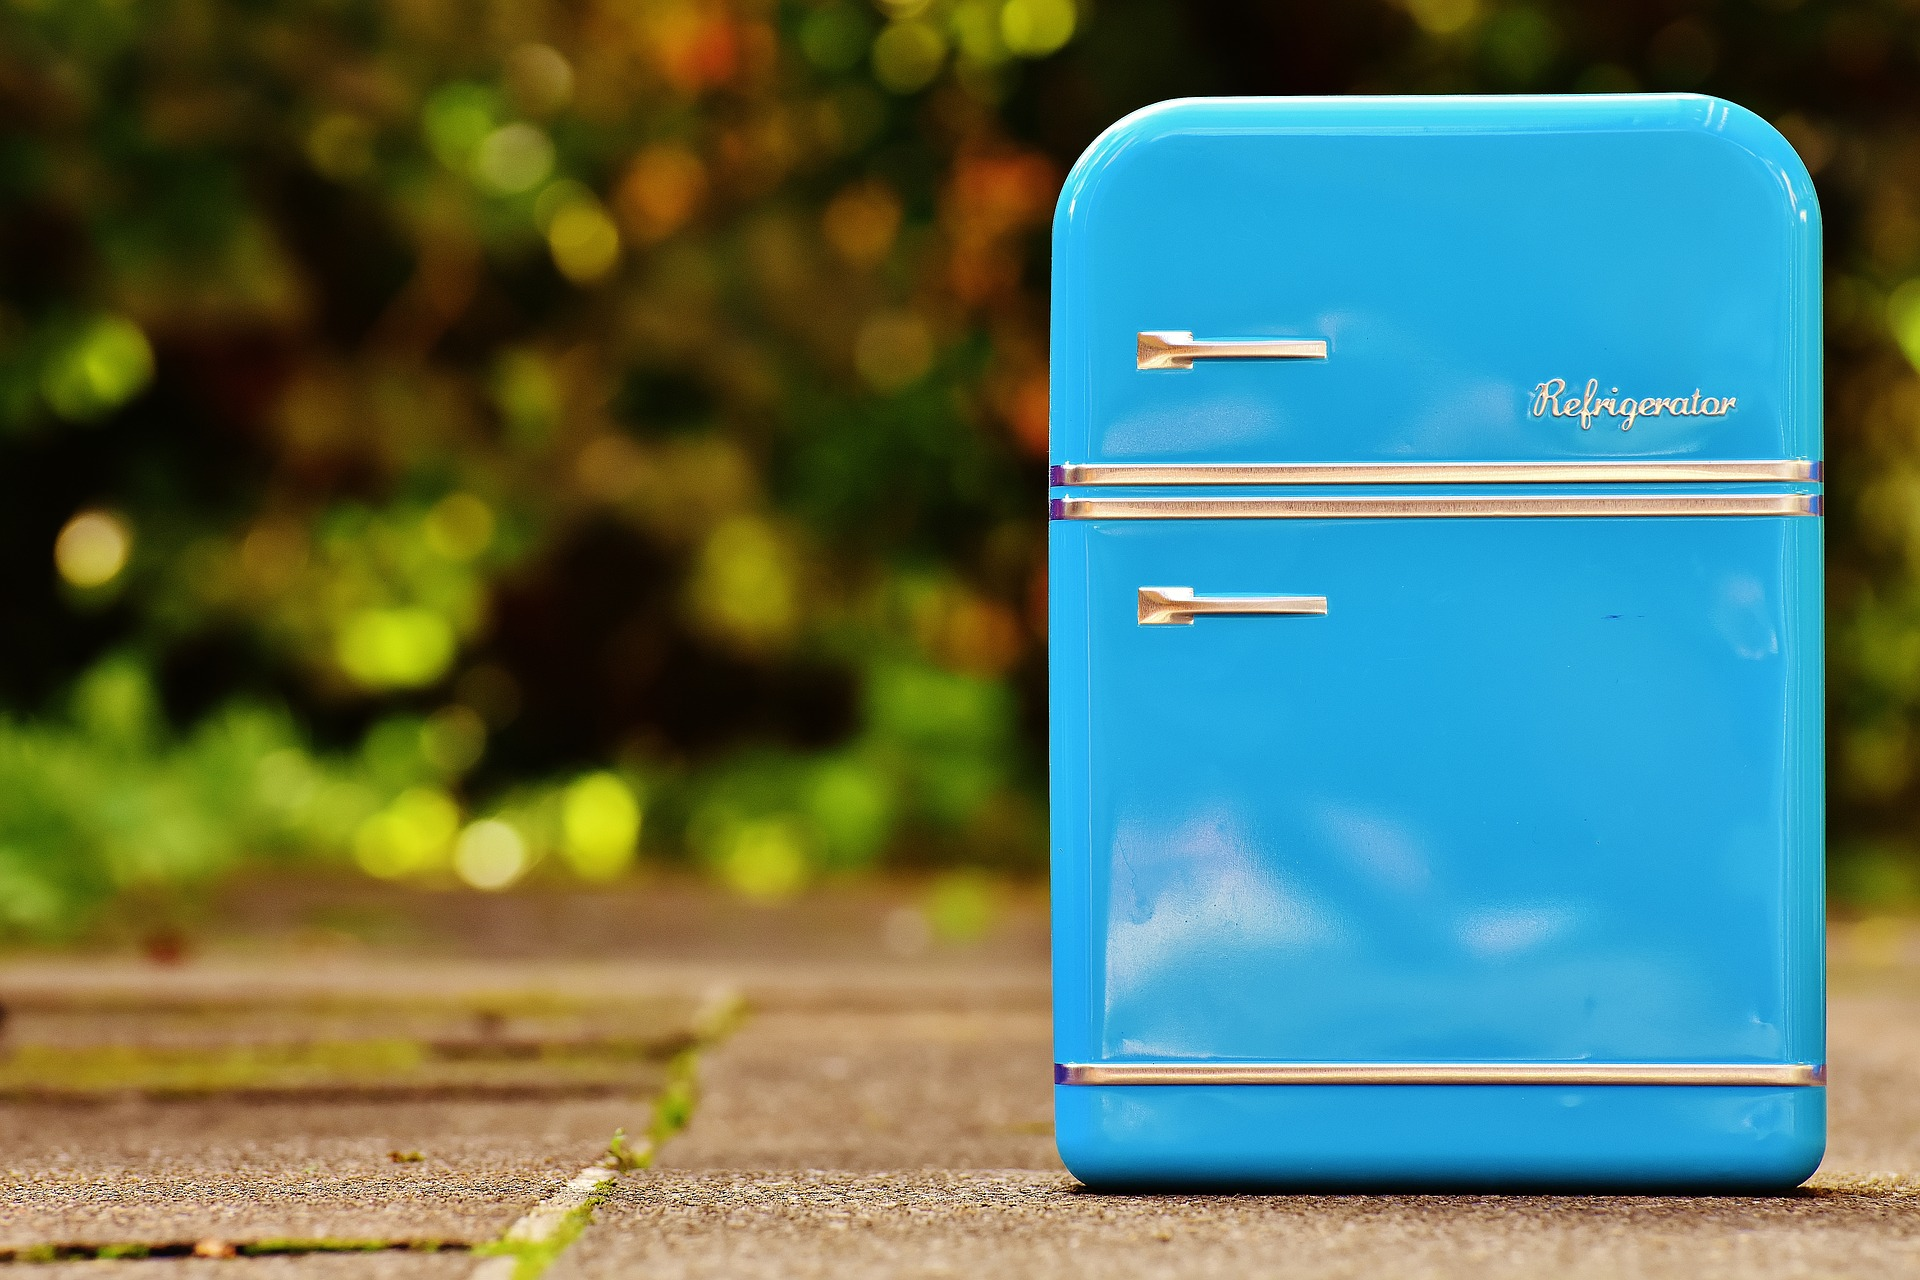 Mini Kühlschrank Abschließbar : ▷ minikühlschrank ◁